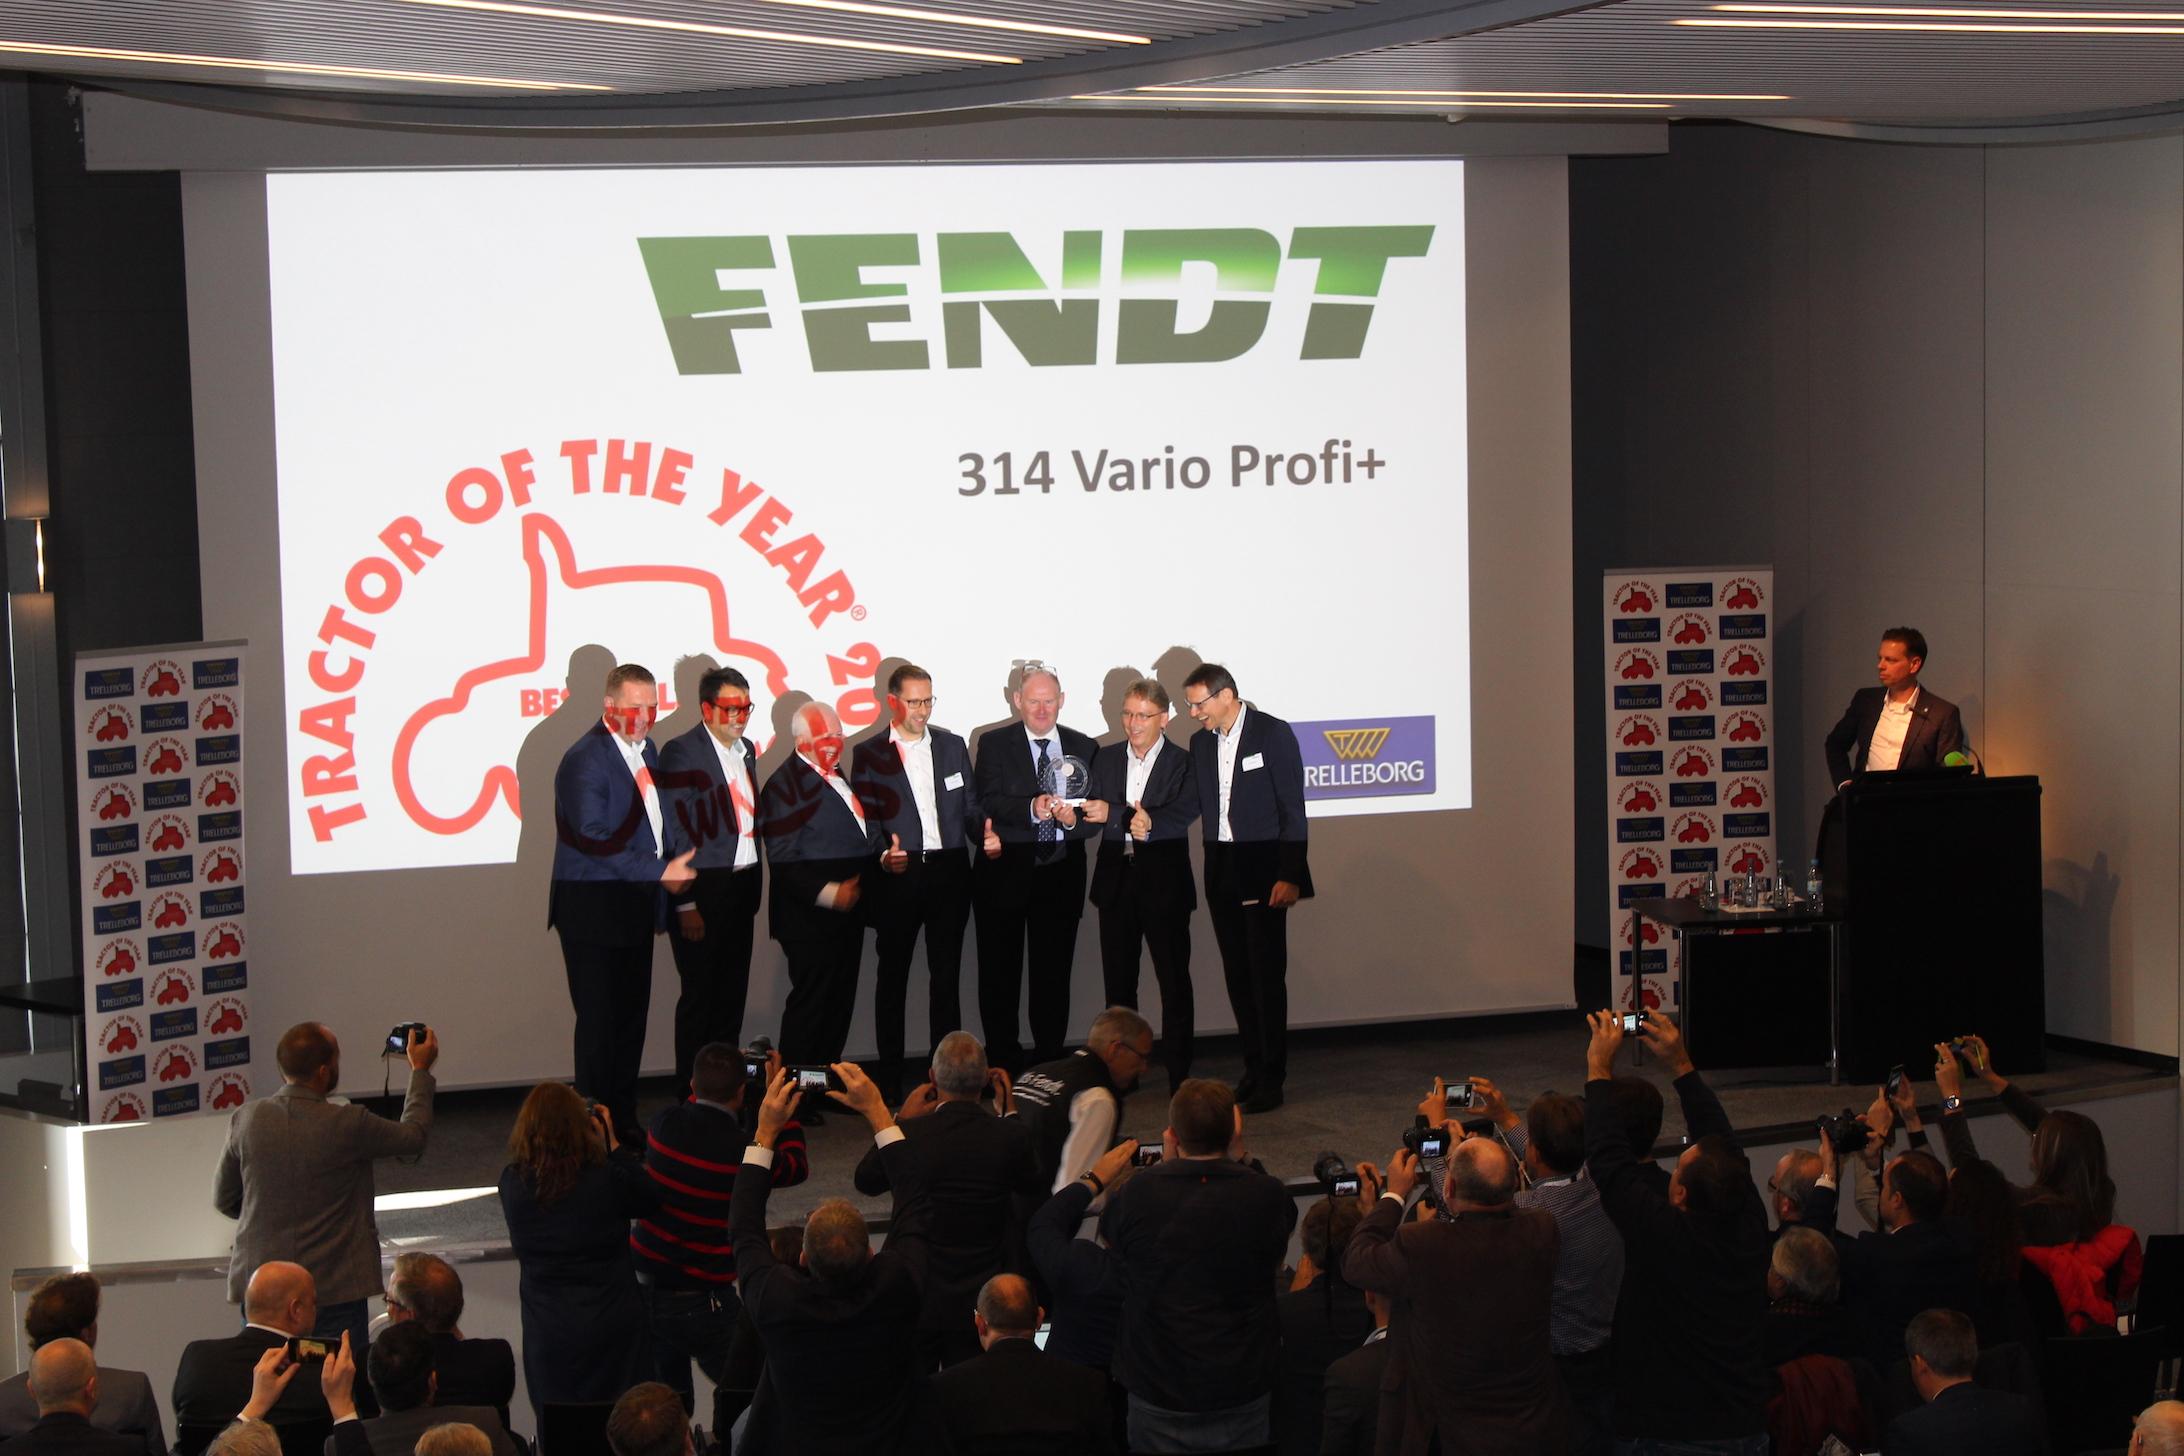 Best Utility 2020: Fendt314 Vario Profi+